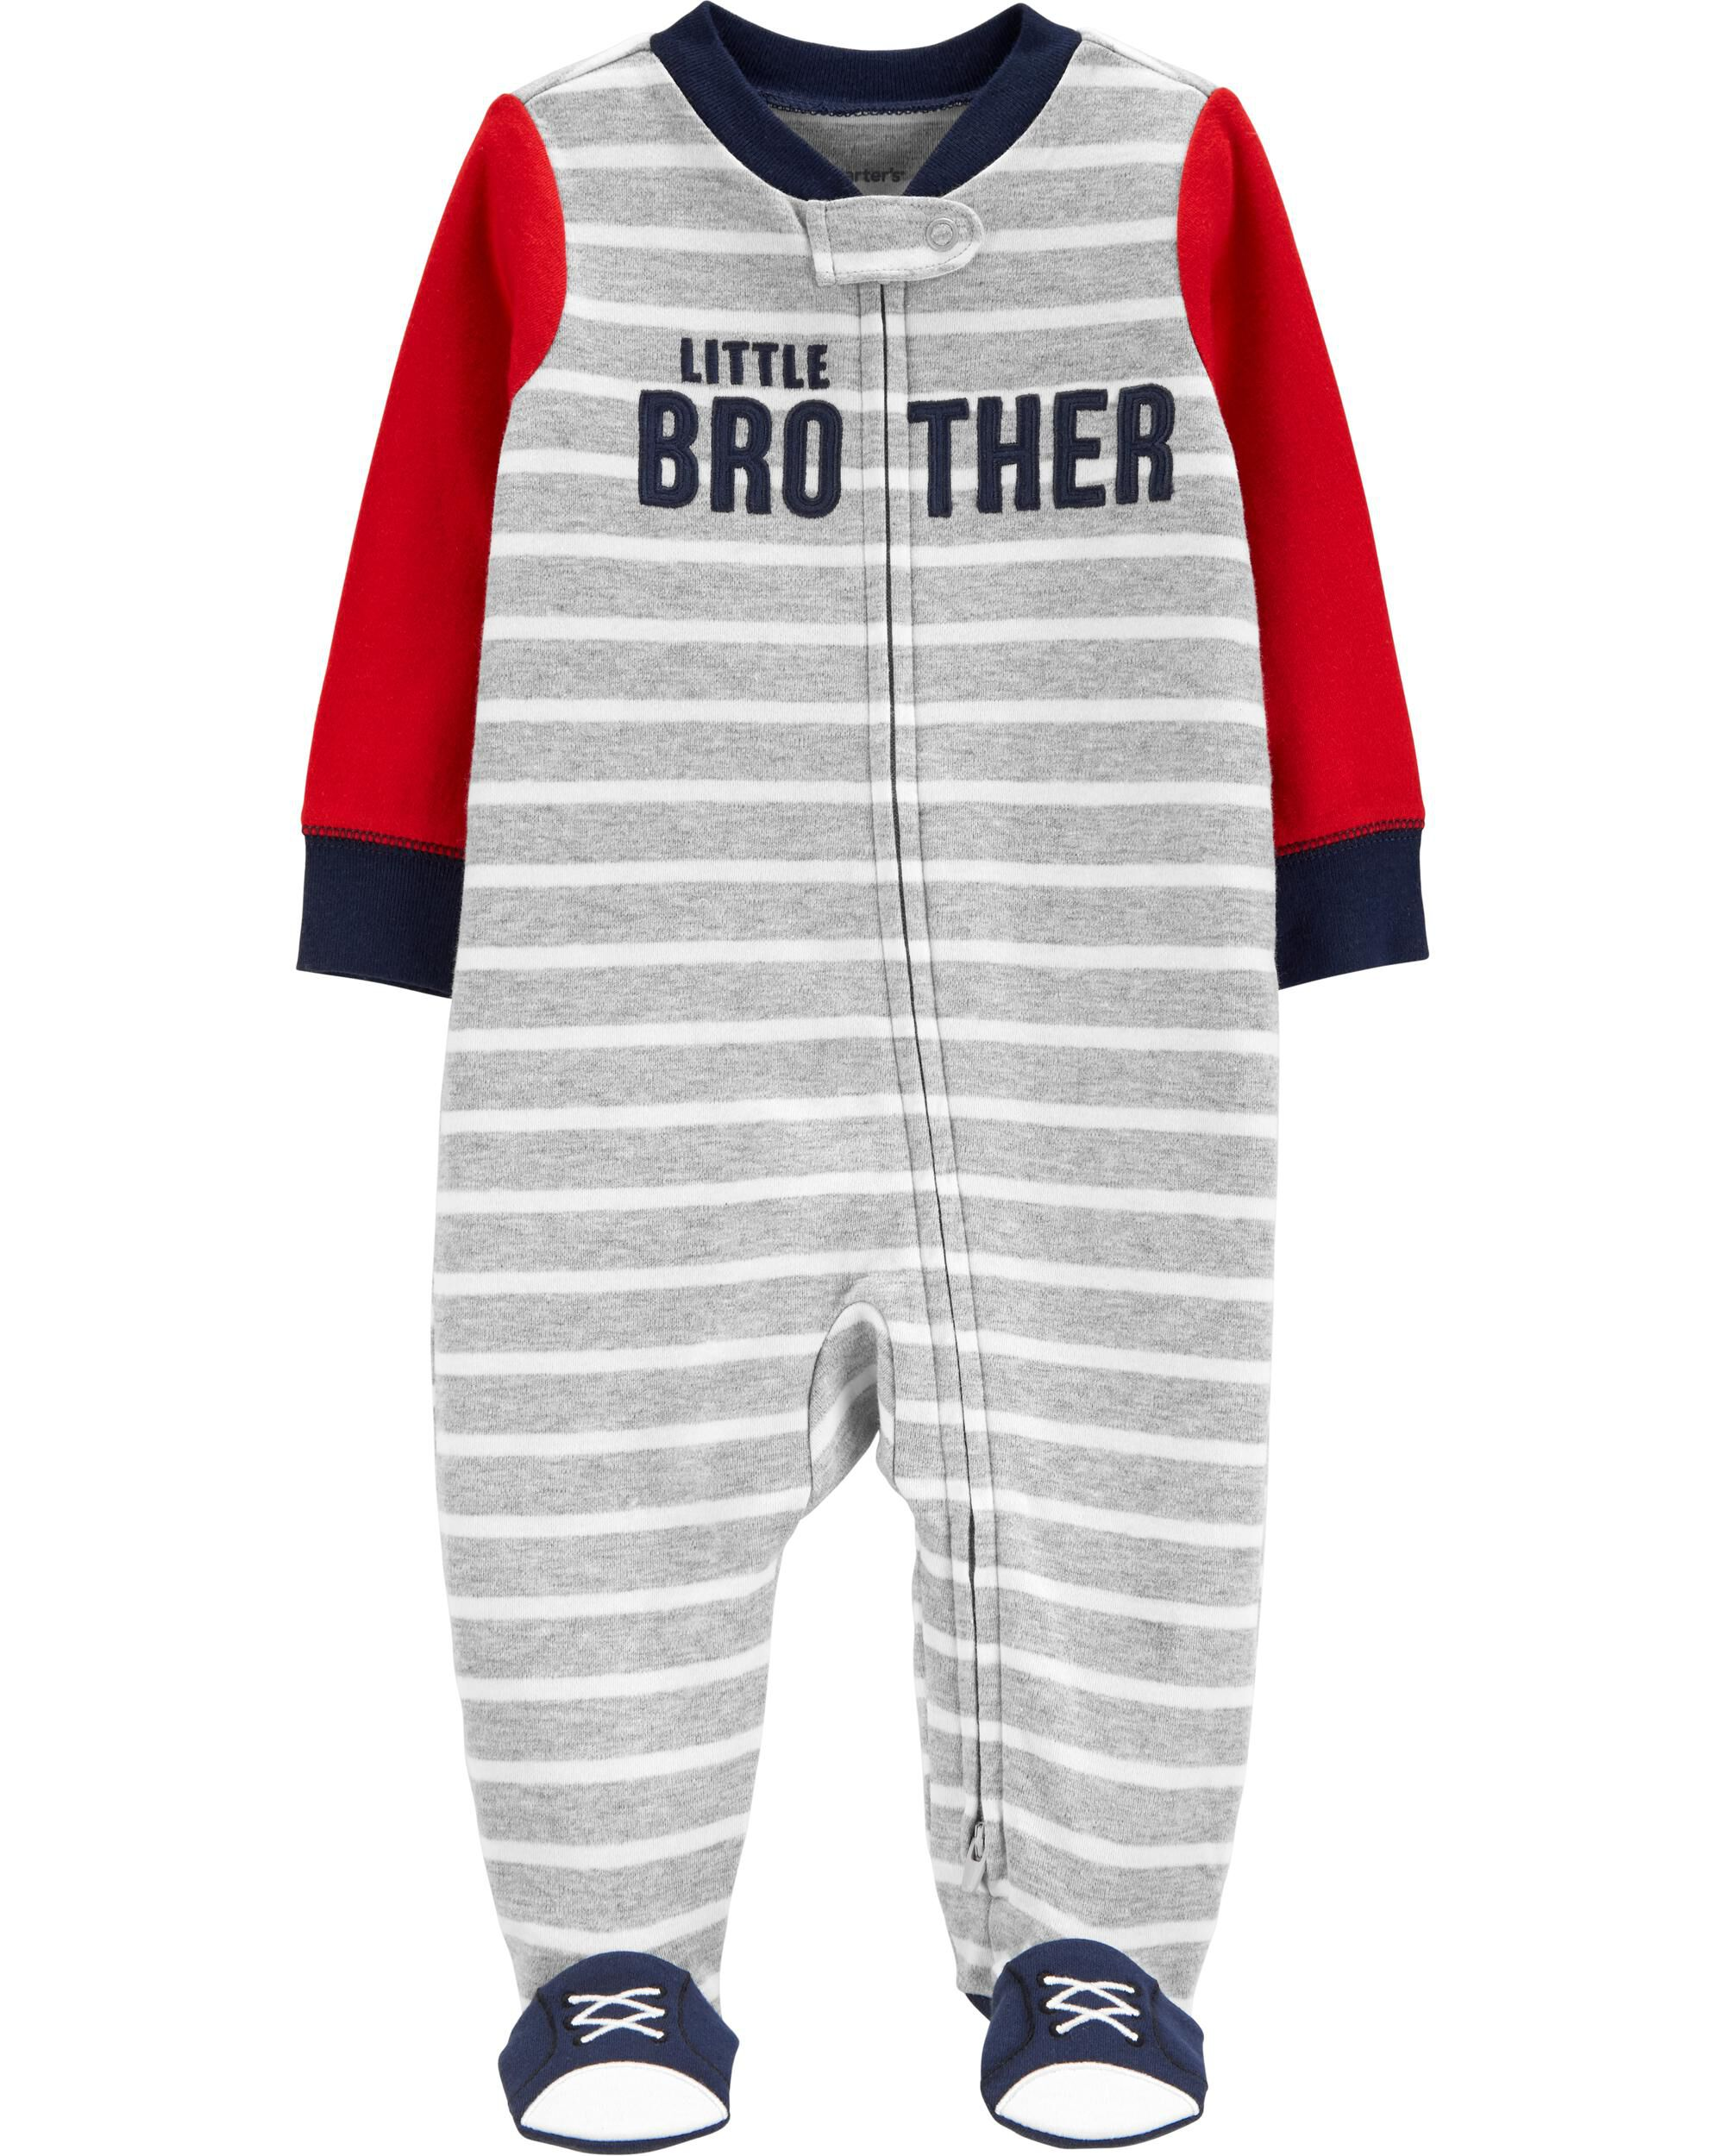 Carters Little Brother 2-Way Zip Sleep & Play